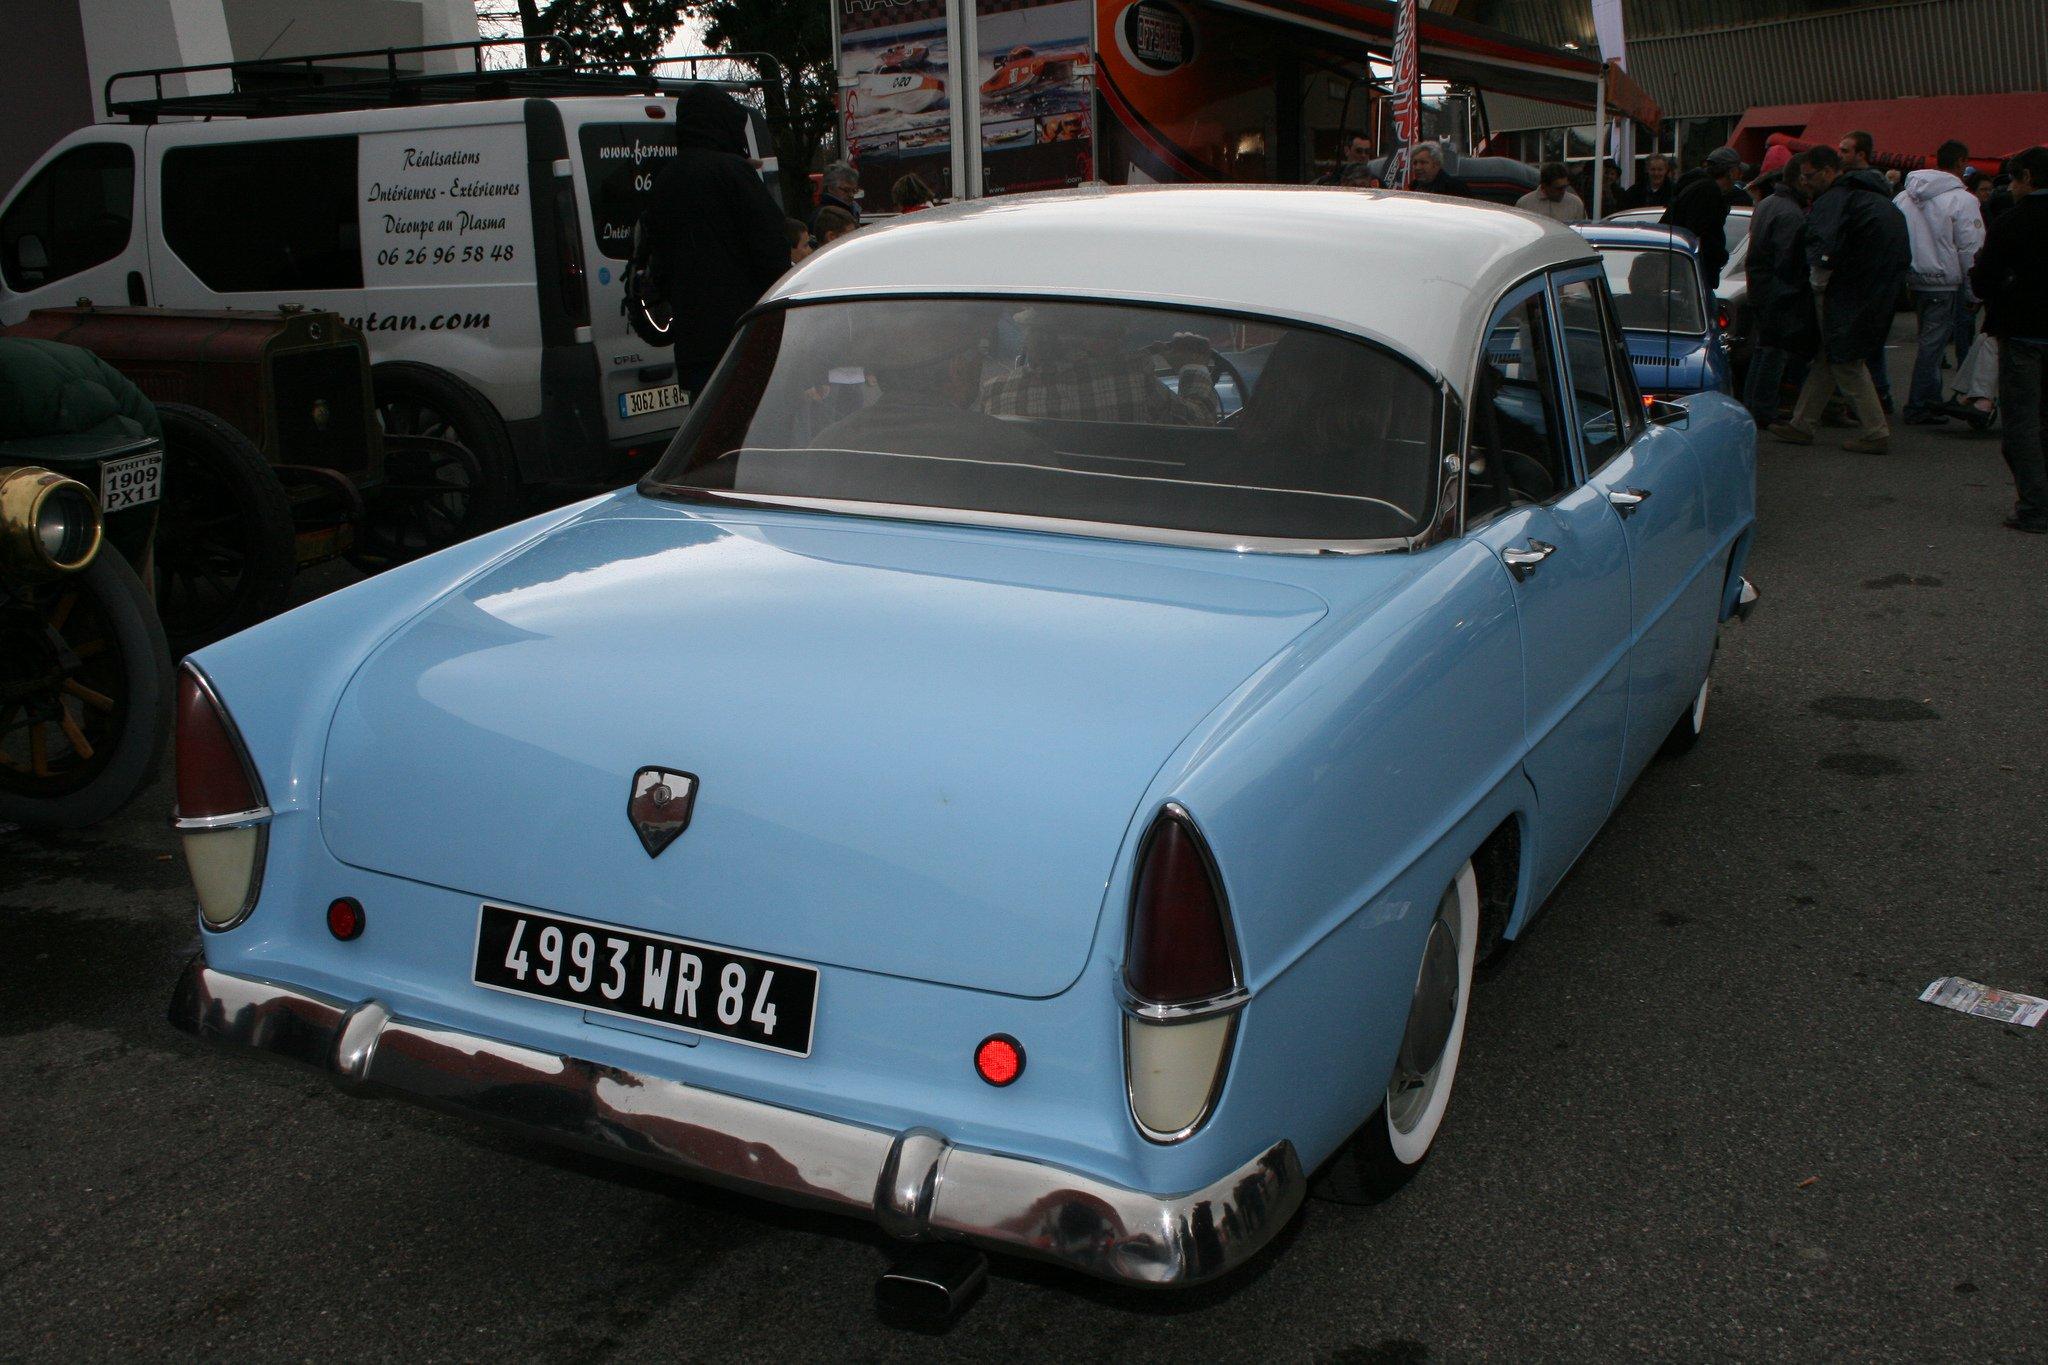 Simca cars classic cars sedan french ariane wallpaper | 2048x1365 | 601229  | WallpaperUP